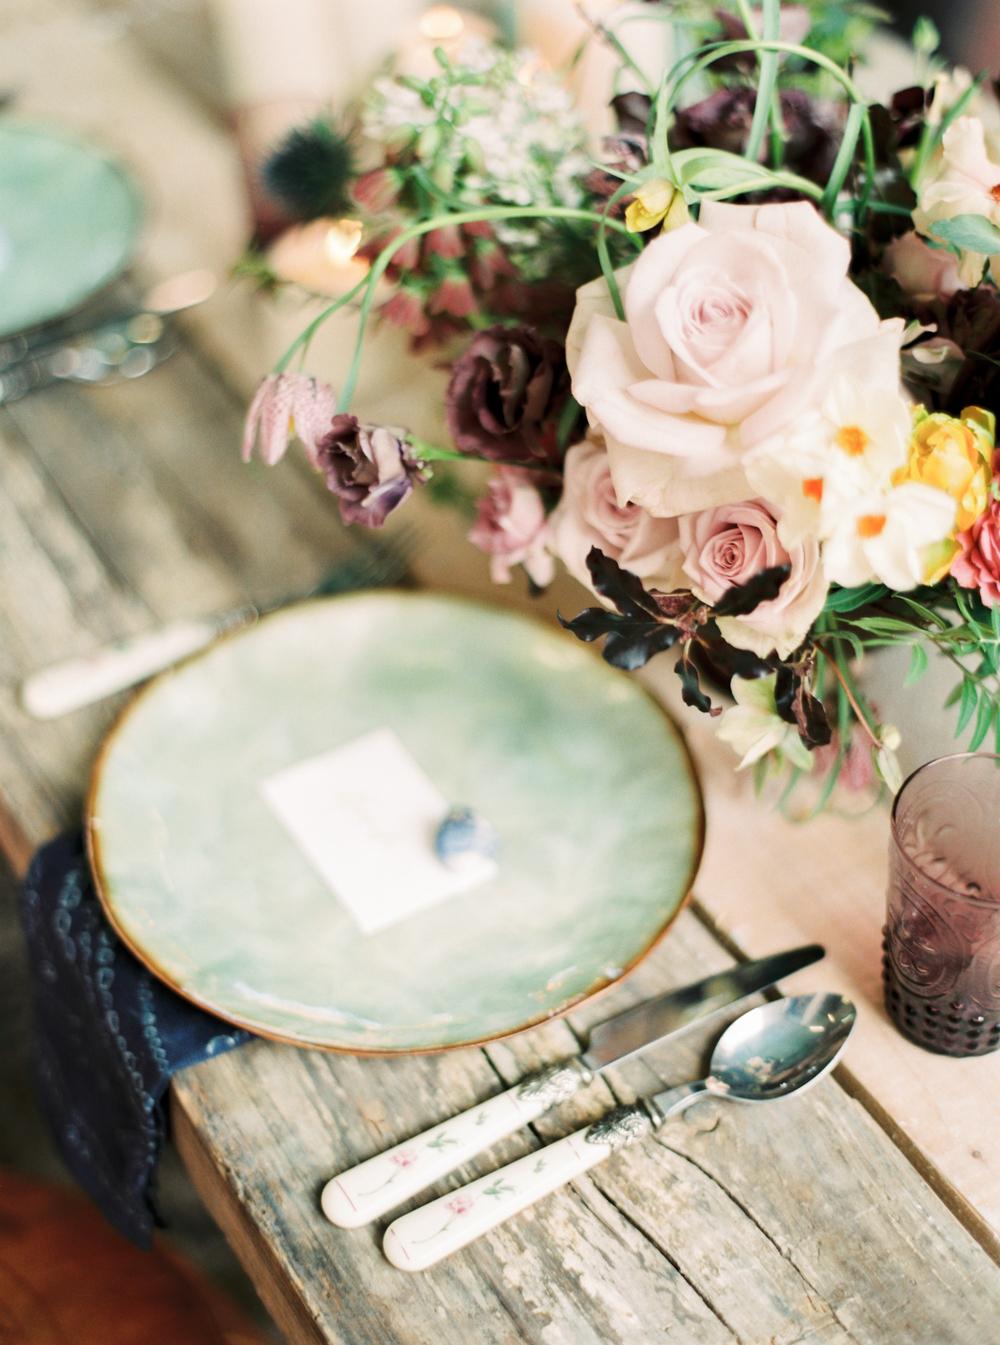 moroccan_floral_boho_vibrant_jewel_tone_nuetral_industrial_wedding_inspiration006.jpg